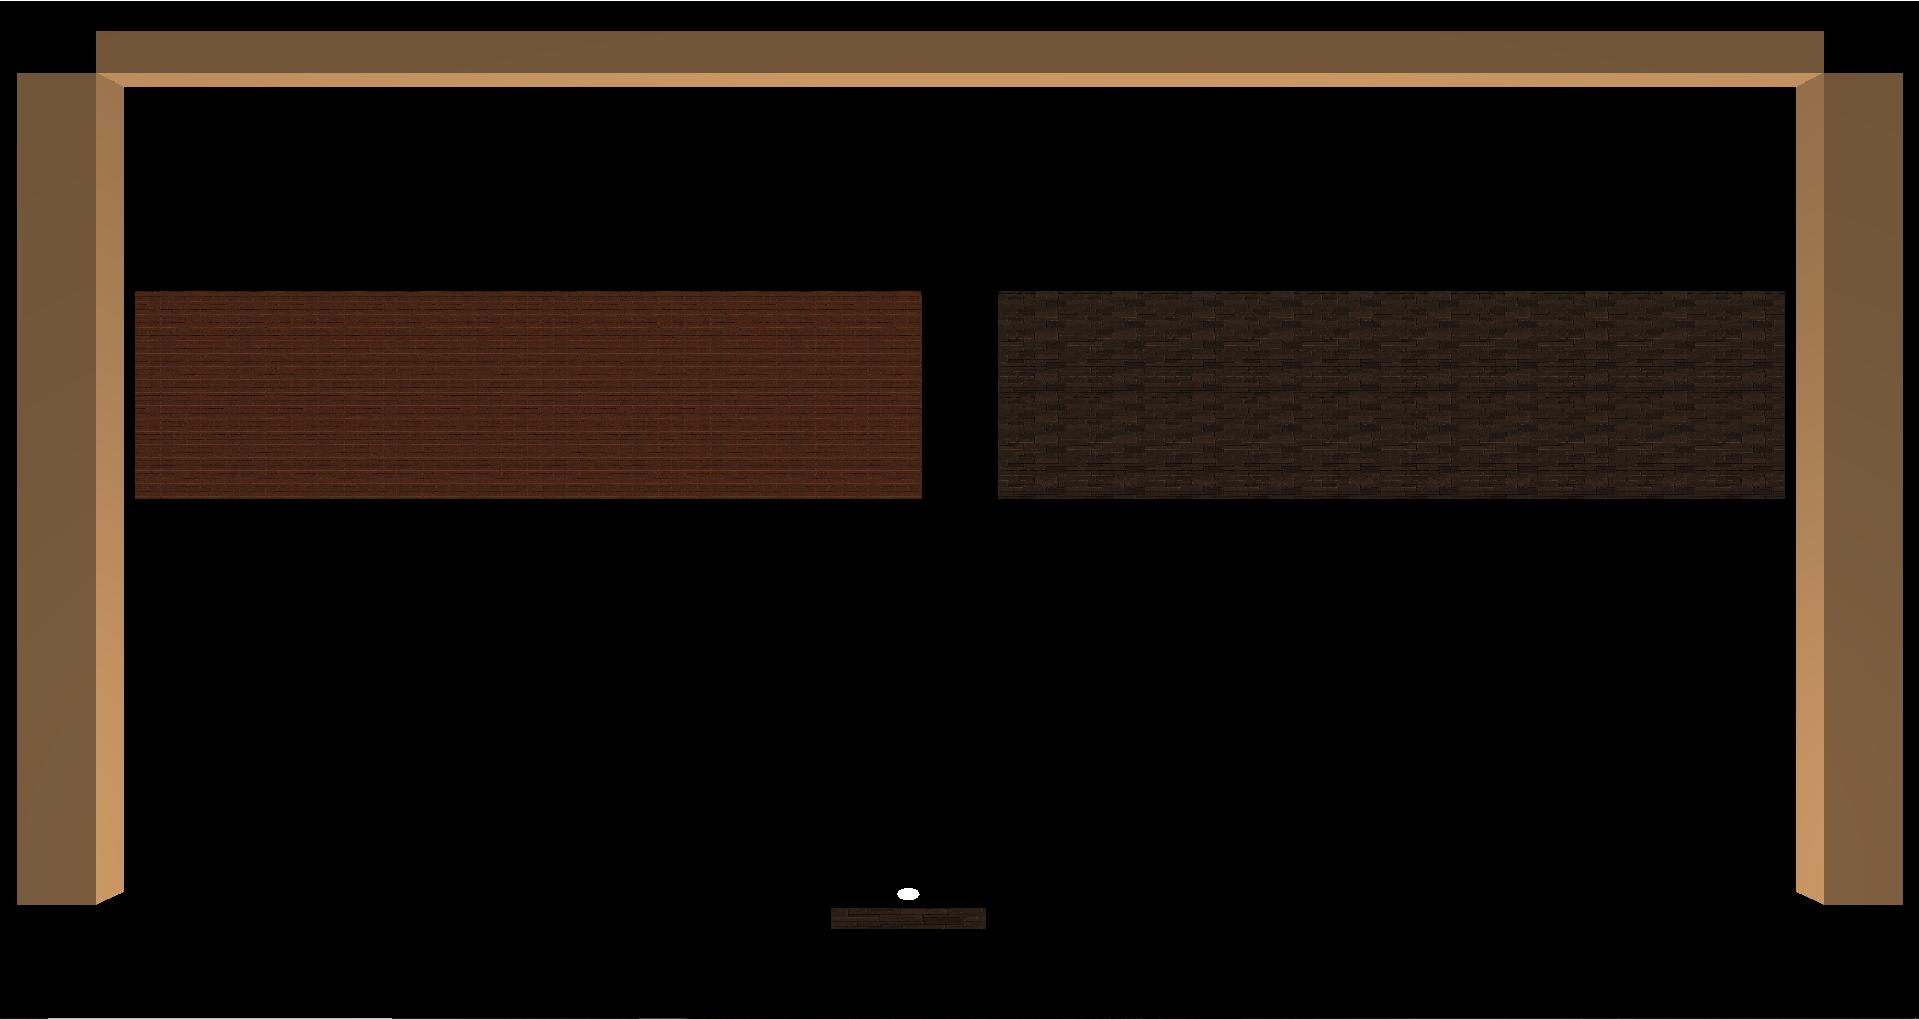 Arkanoid with OpenGL